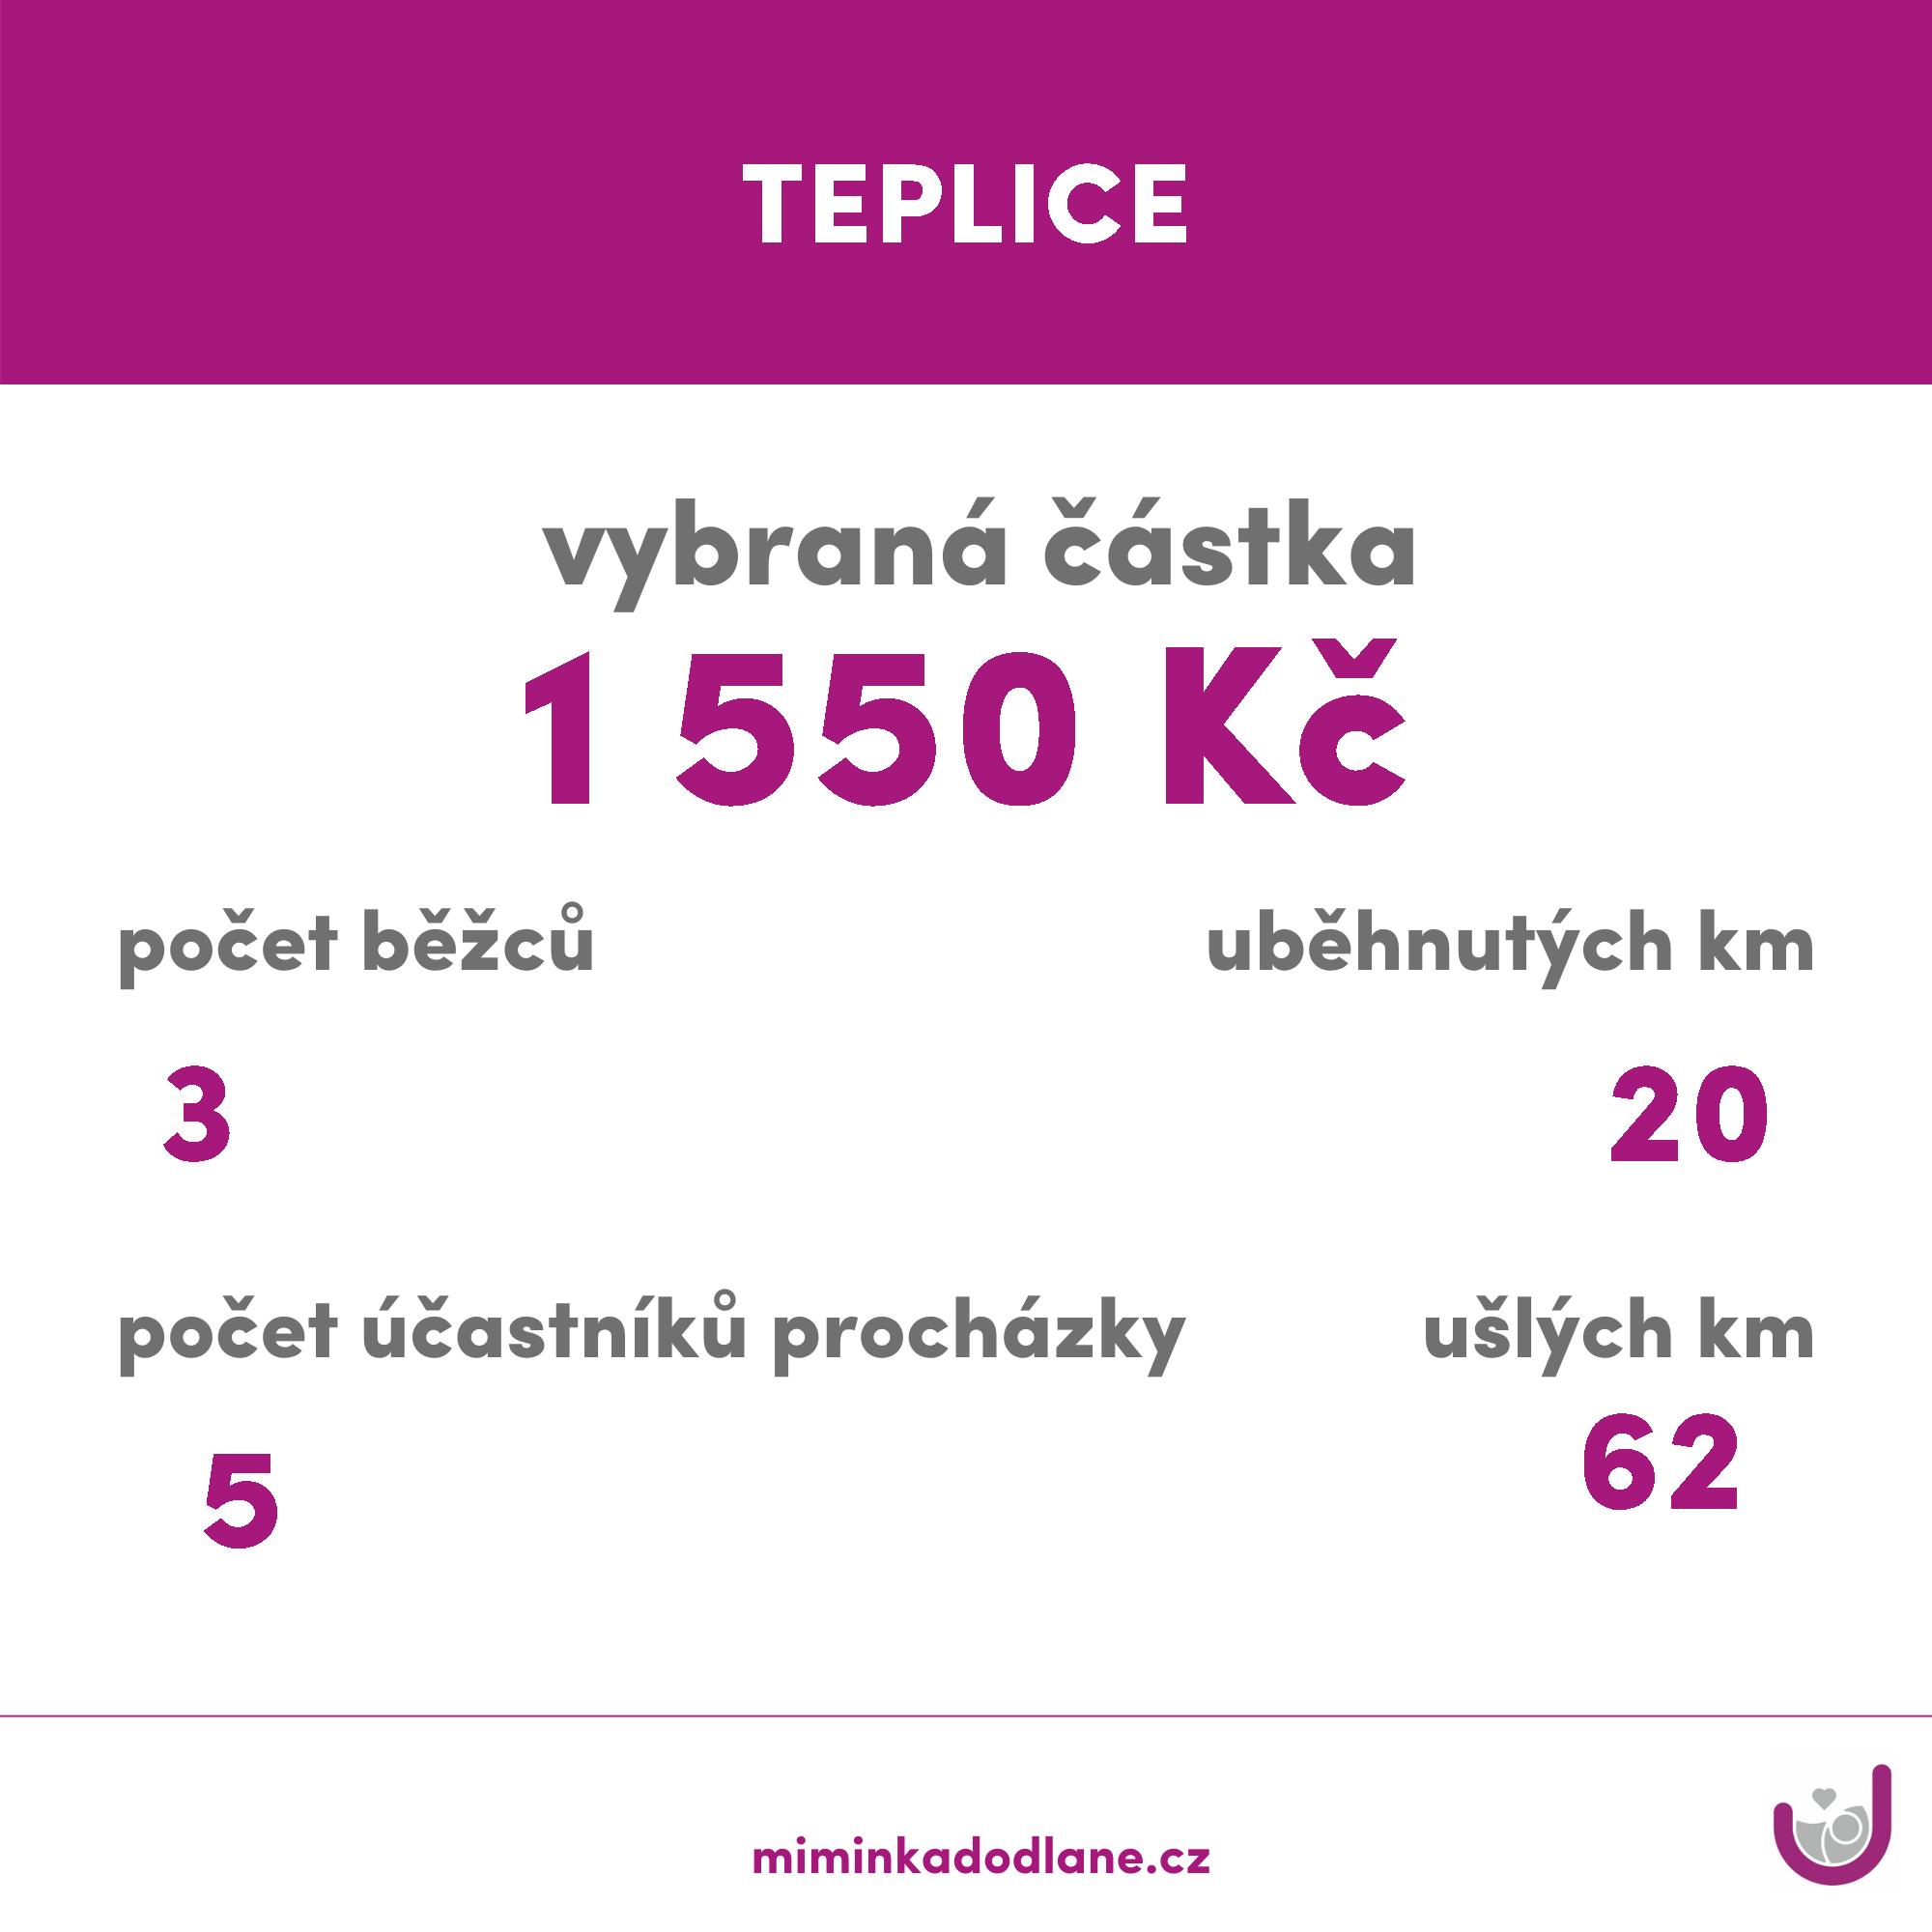 TEPLICE